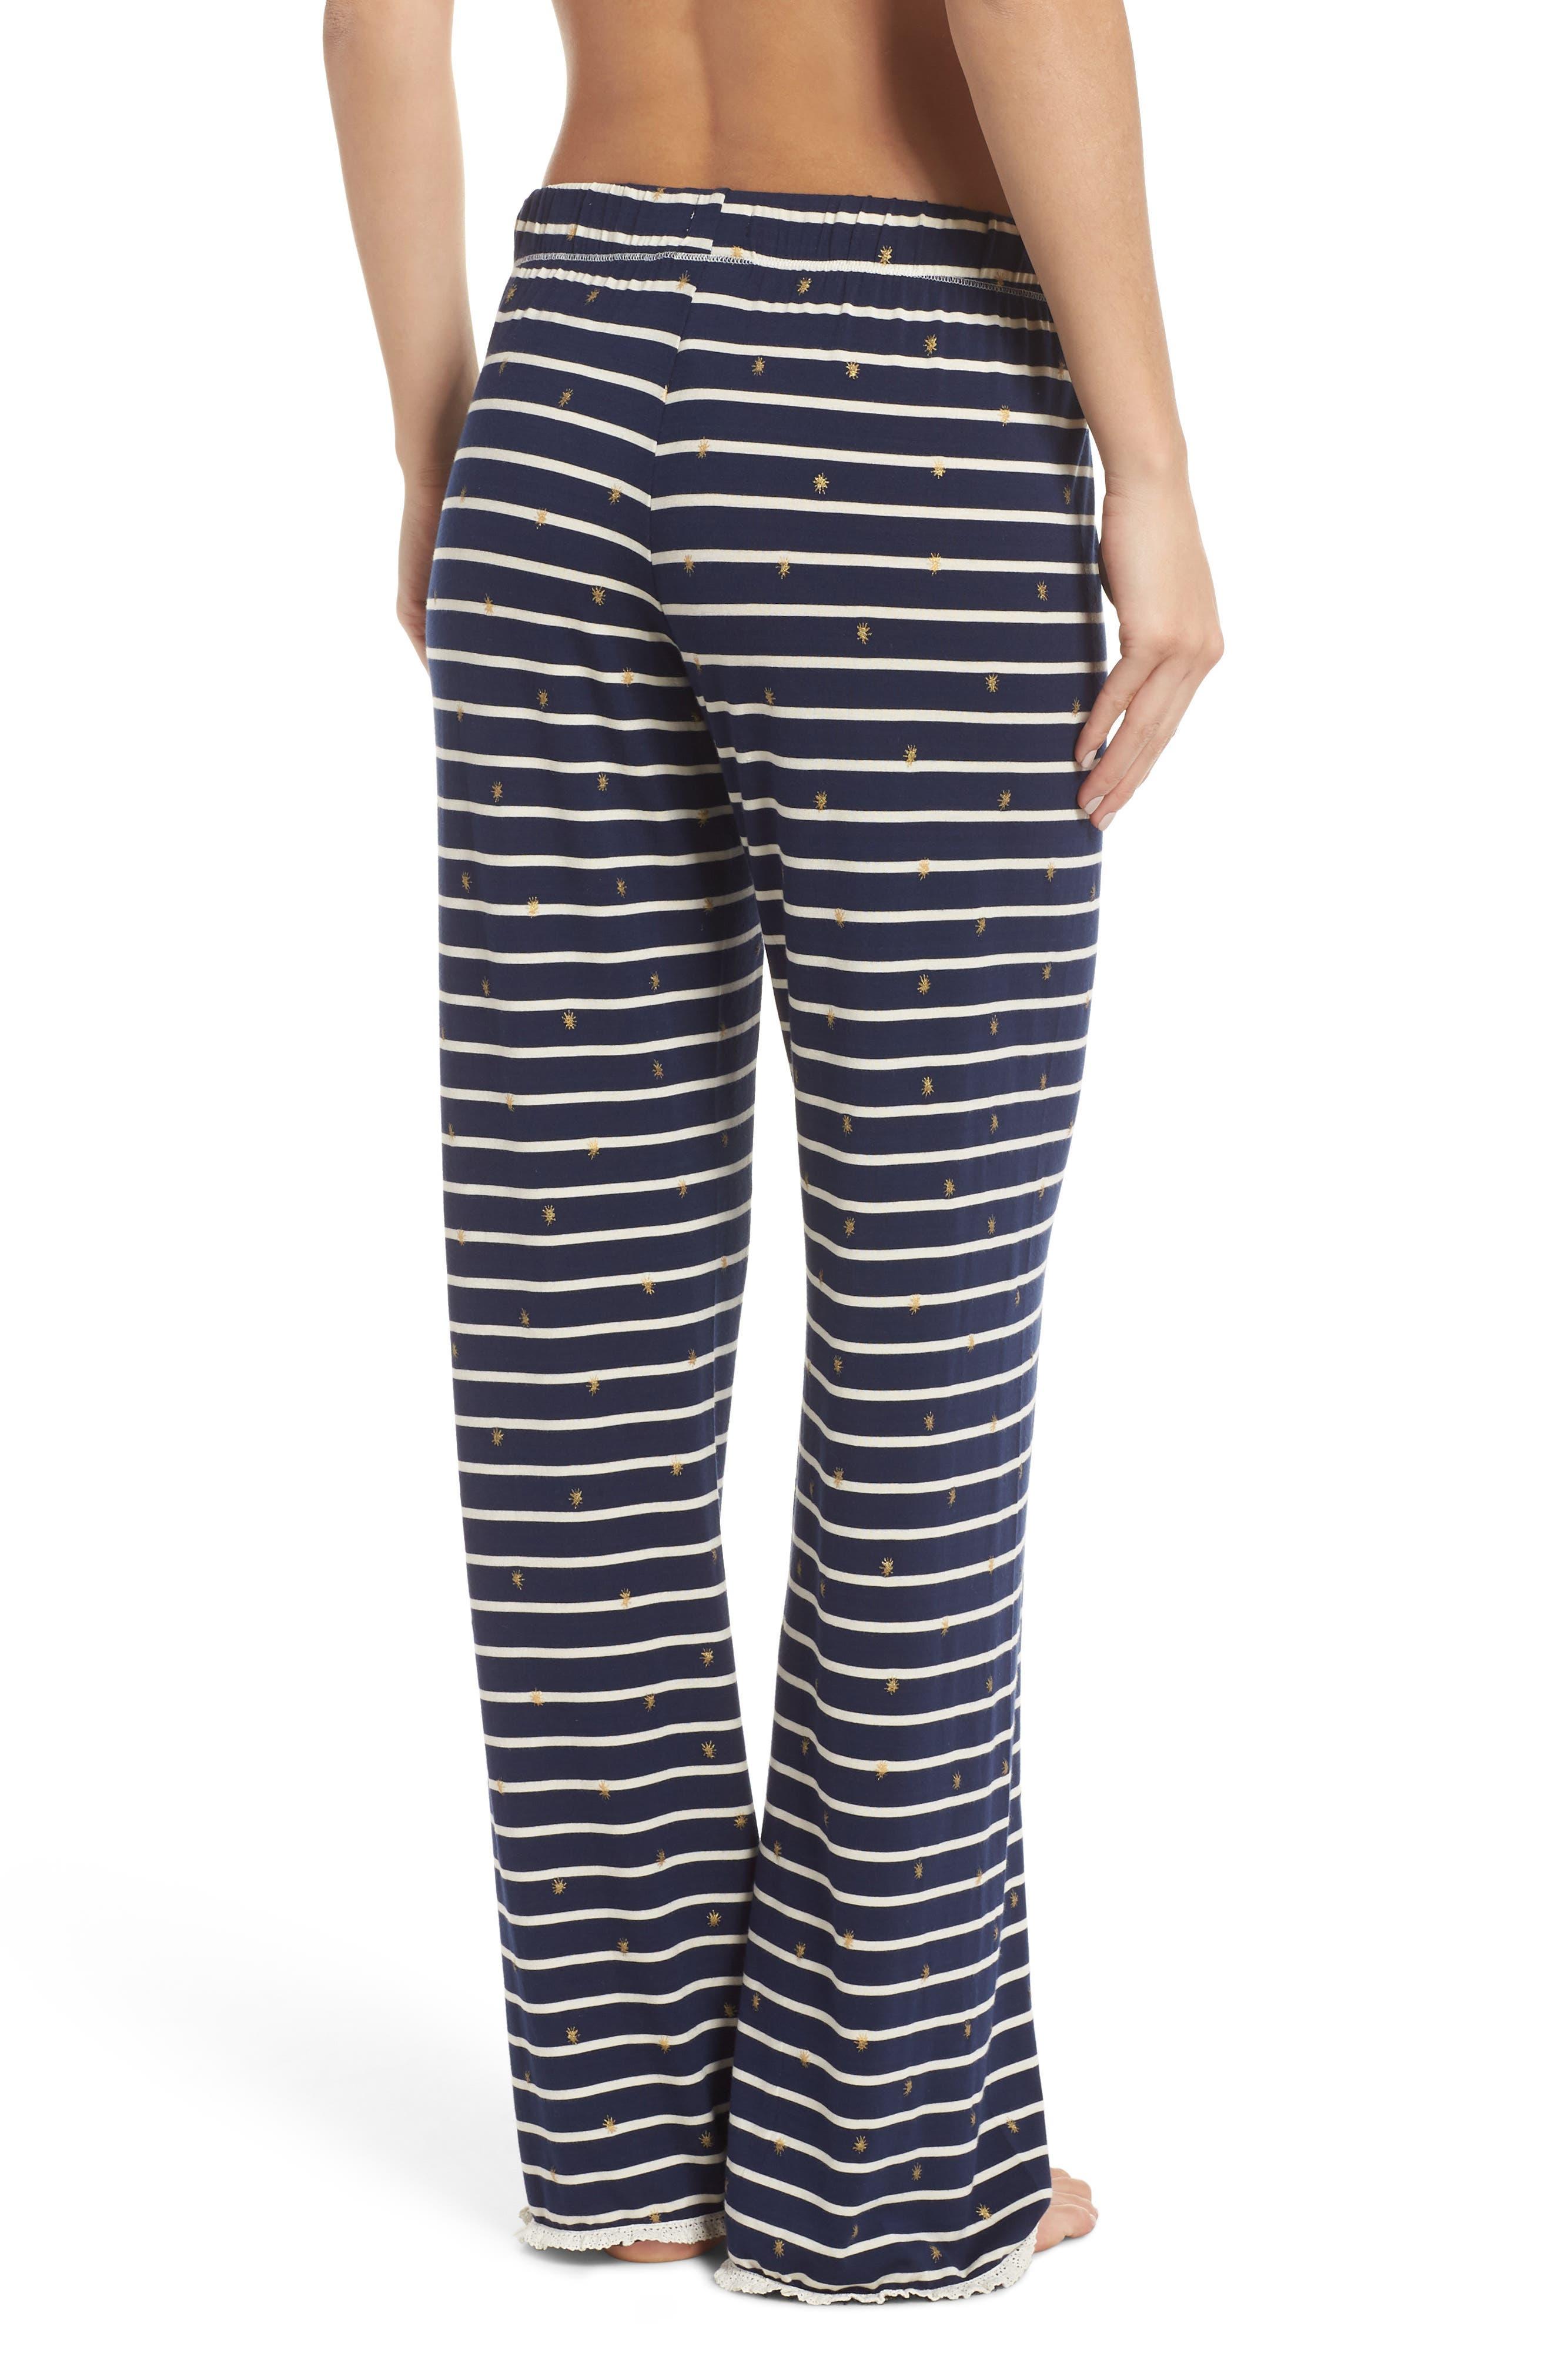 HATLEY, Cozy Pajama Pants, Alternate thumbnail 2, color, BLUE